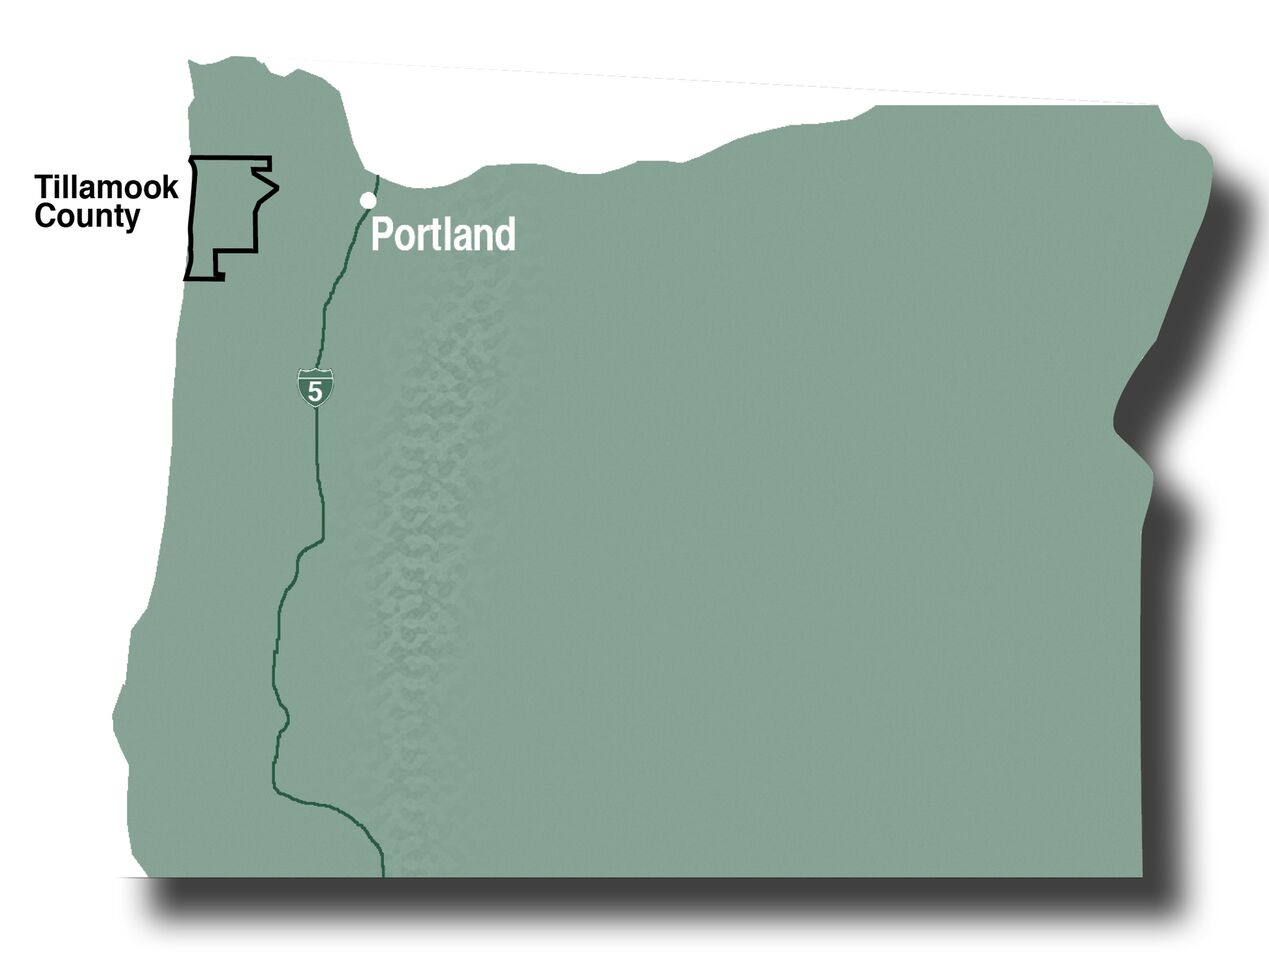 Tillamook County map